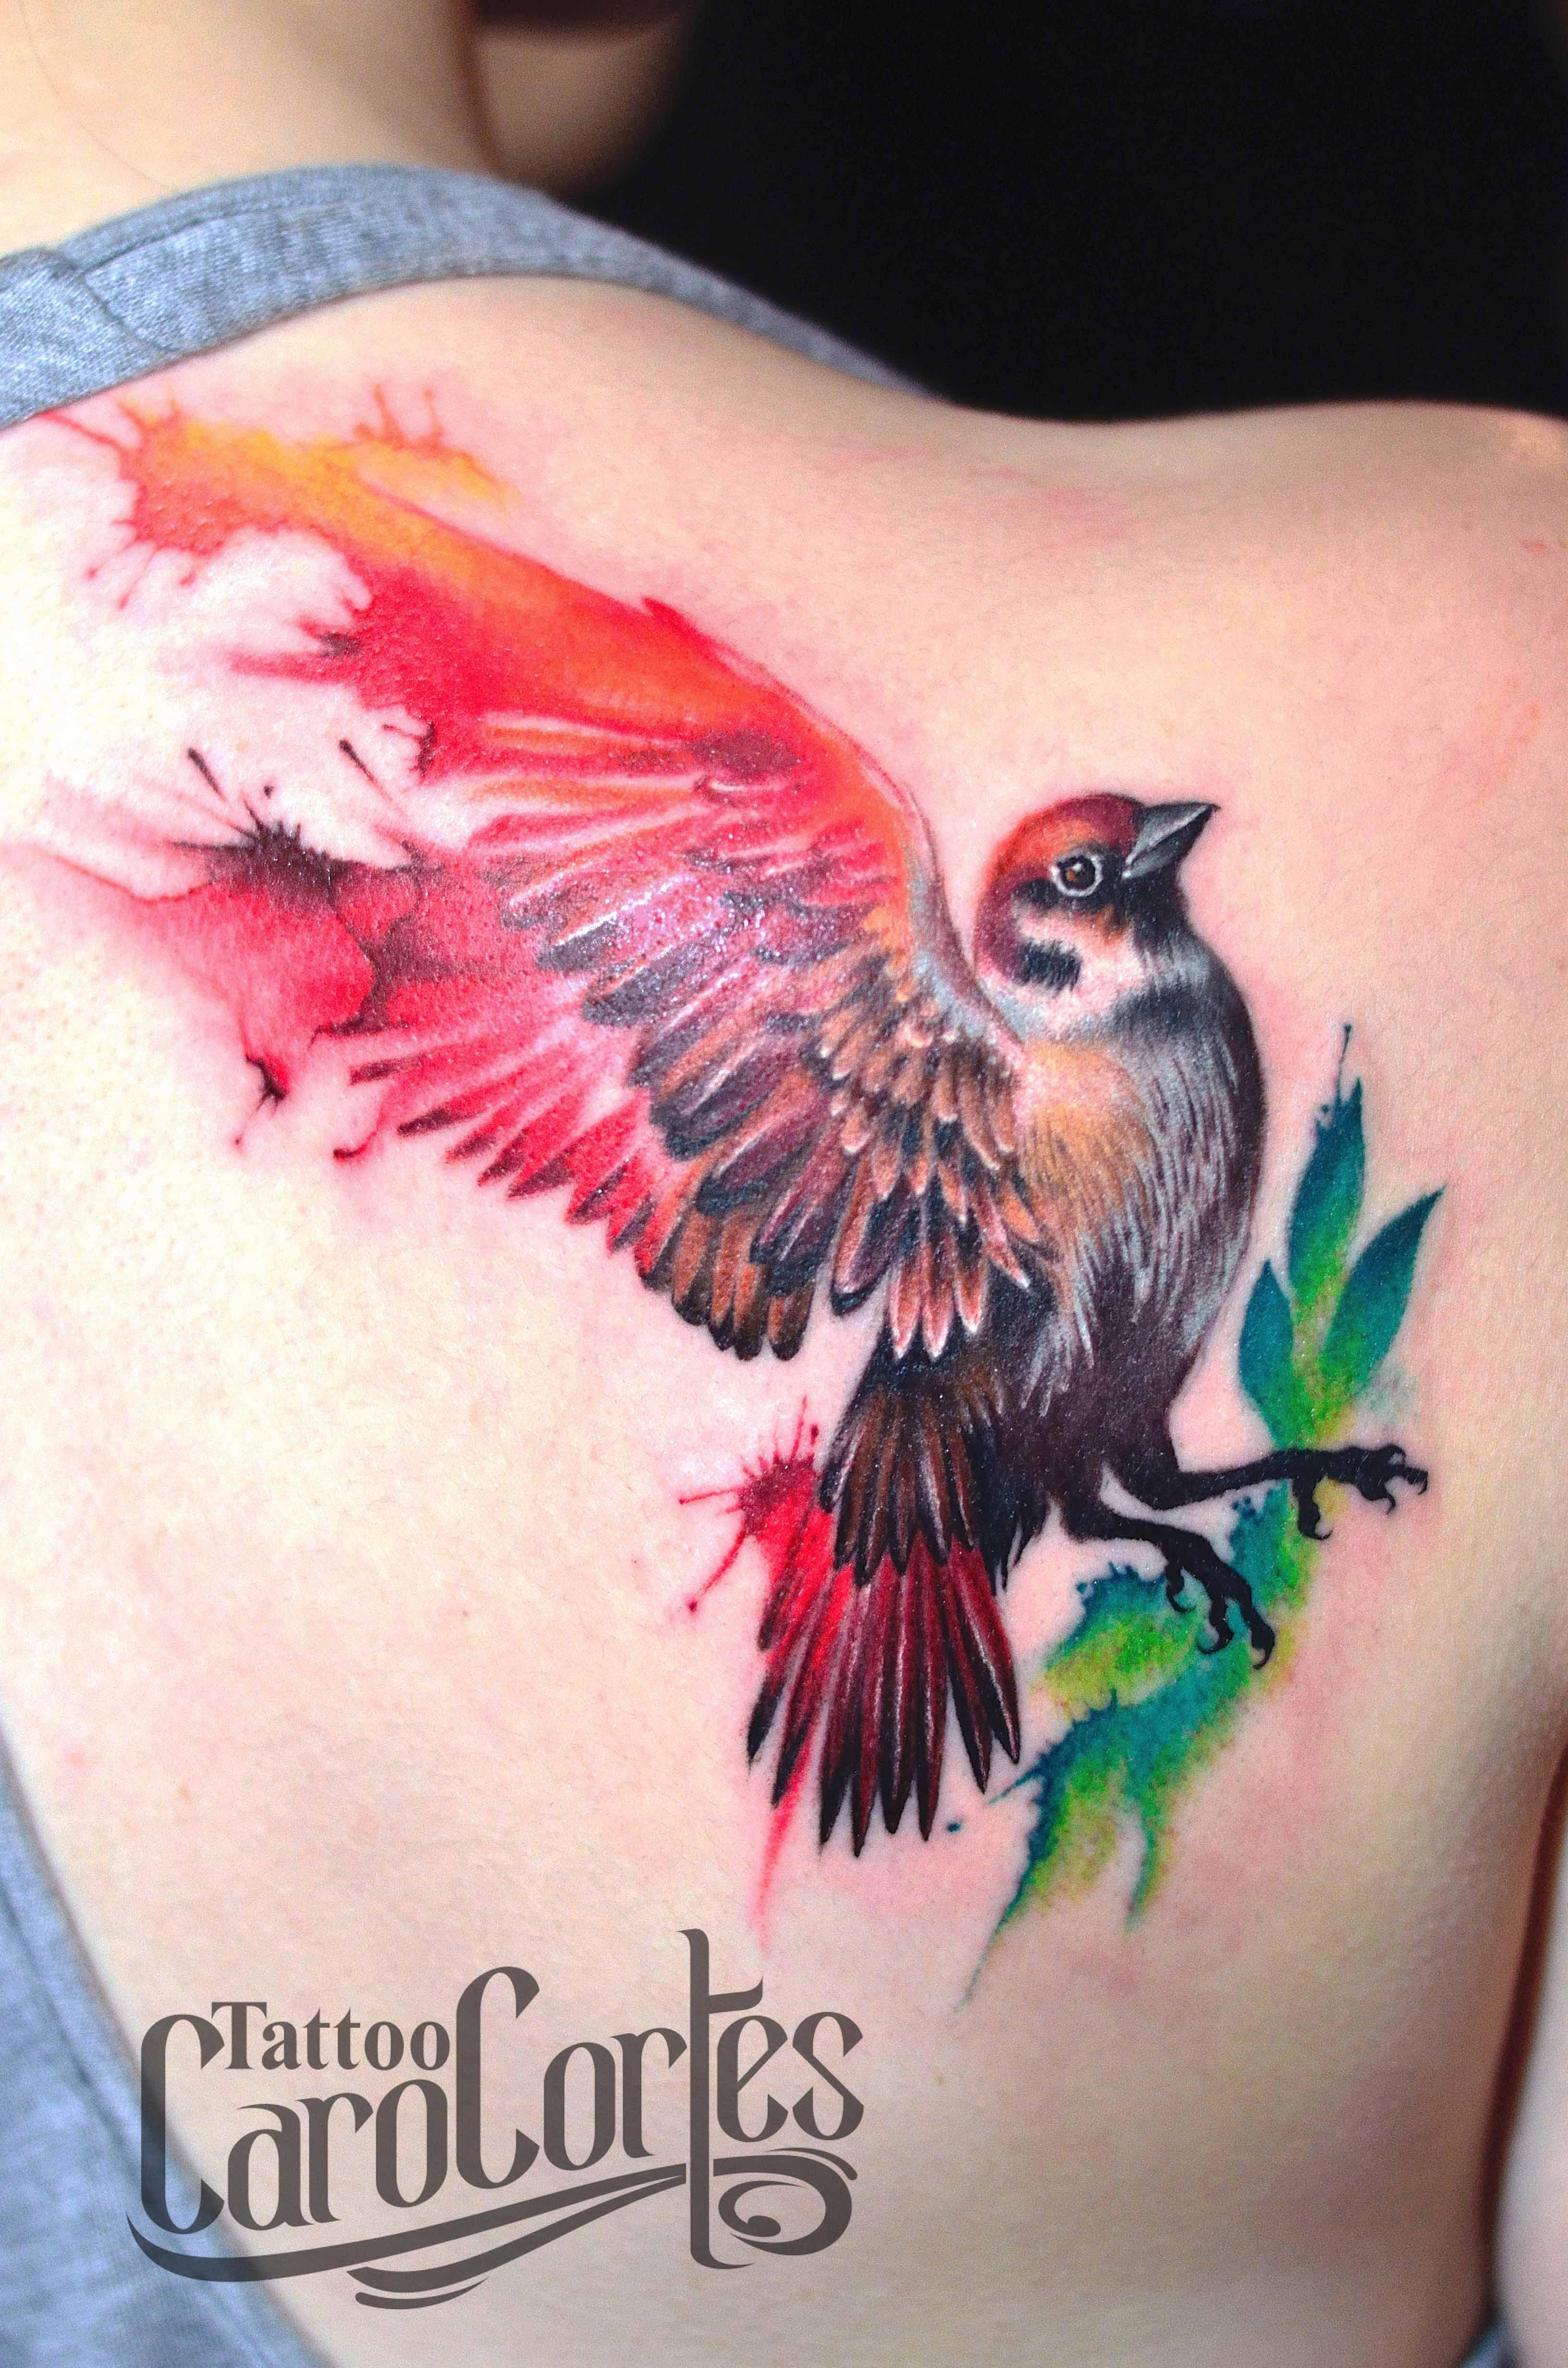 Watercolor tattoo artists in houston texas - Watercolor Sparrow Acuarela Y Gorrion Caro Cortes Colombian Tattoo Artist Carocortes Tumblr